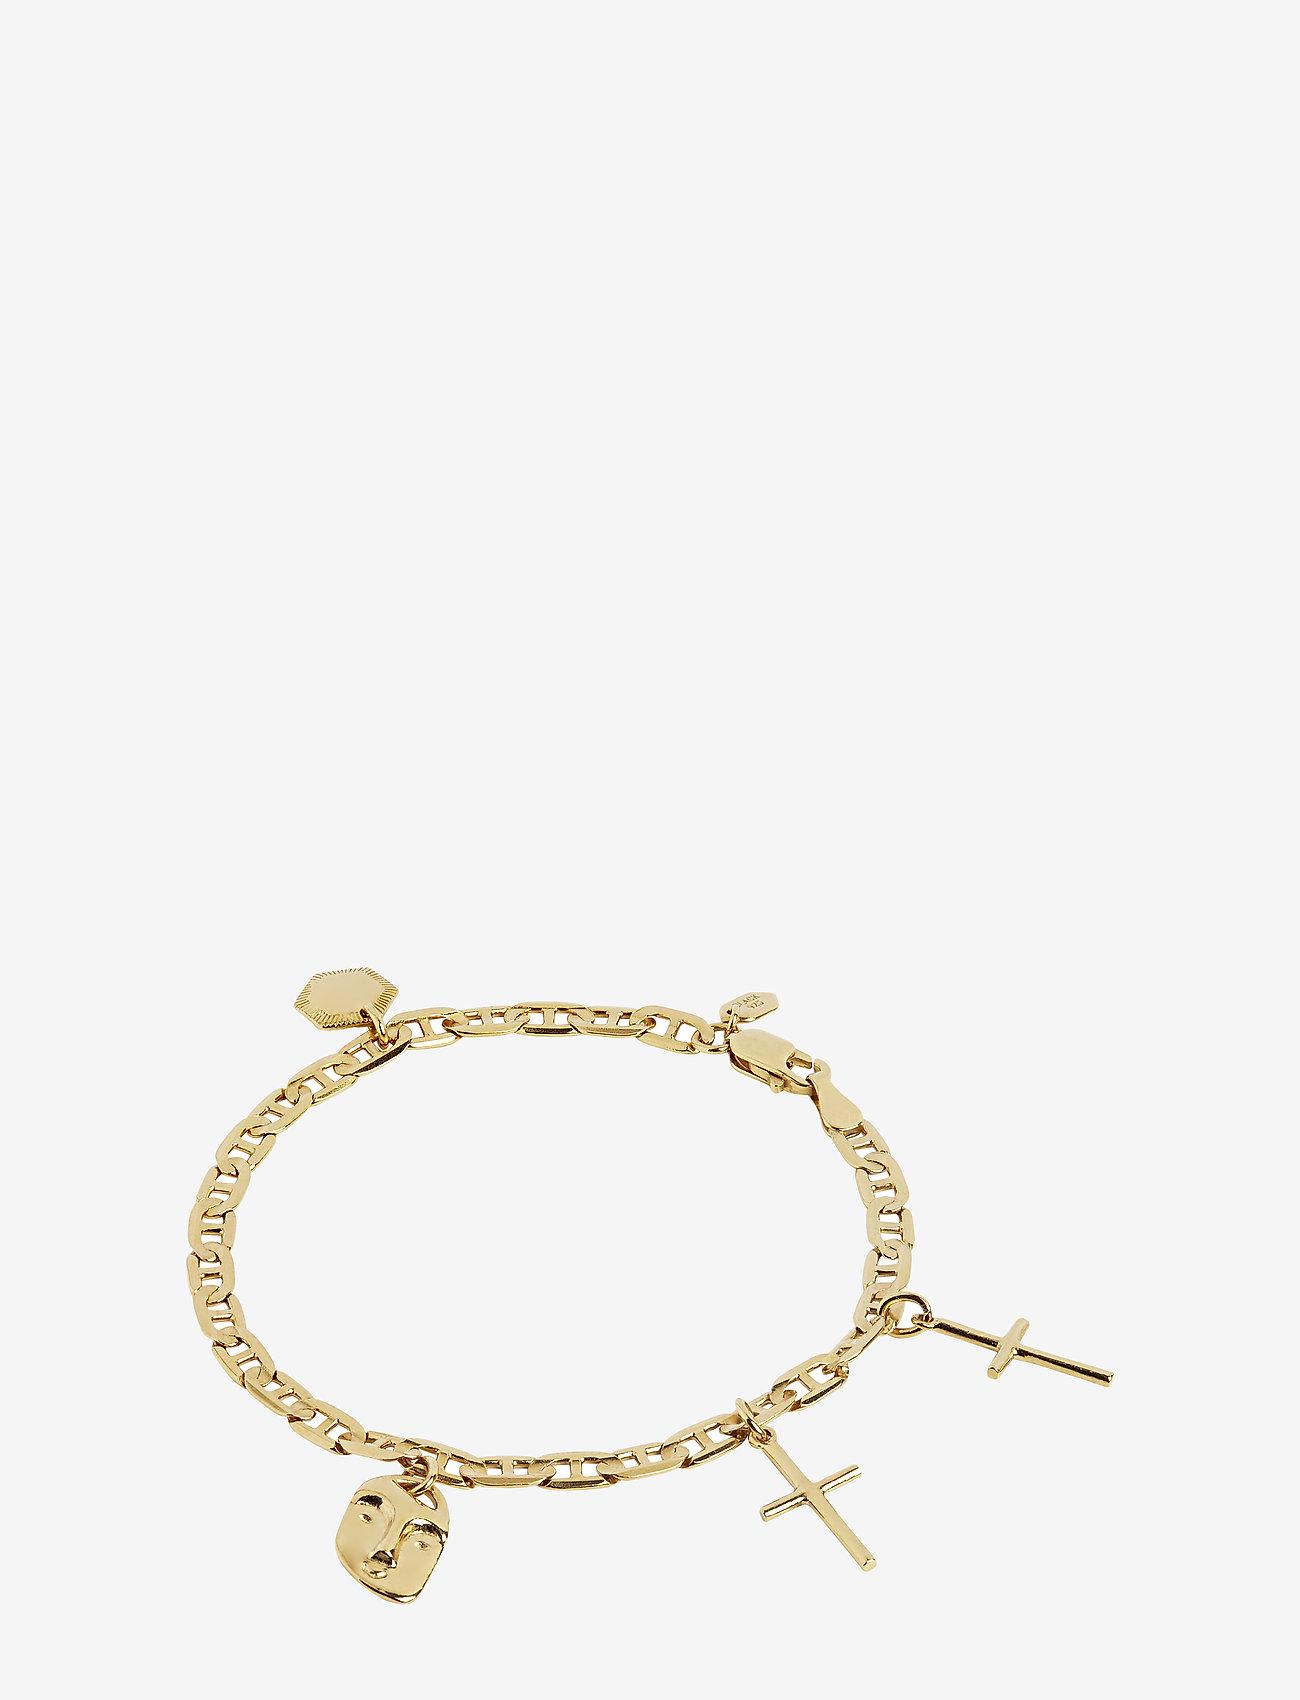 Maria Black - Friend Charm Bracelet Small - dainty - gold hp